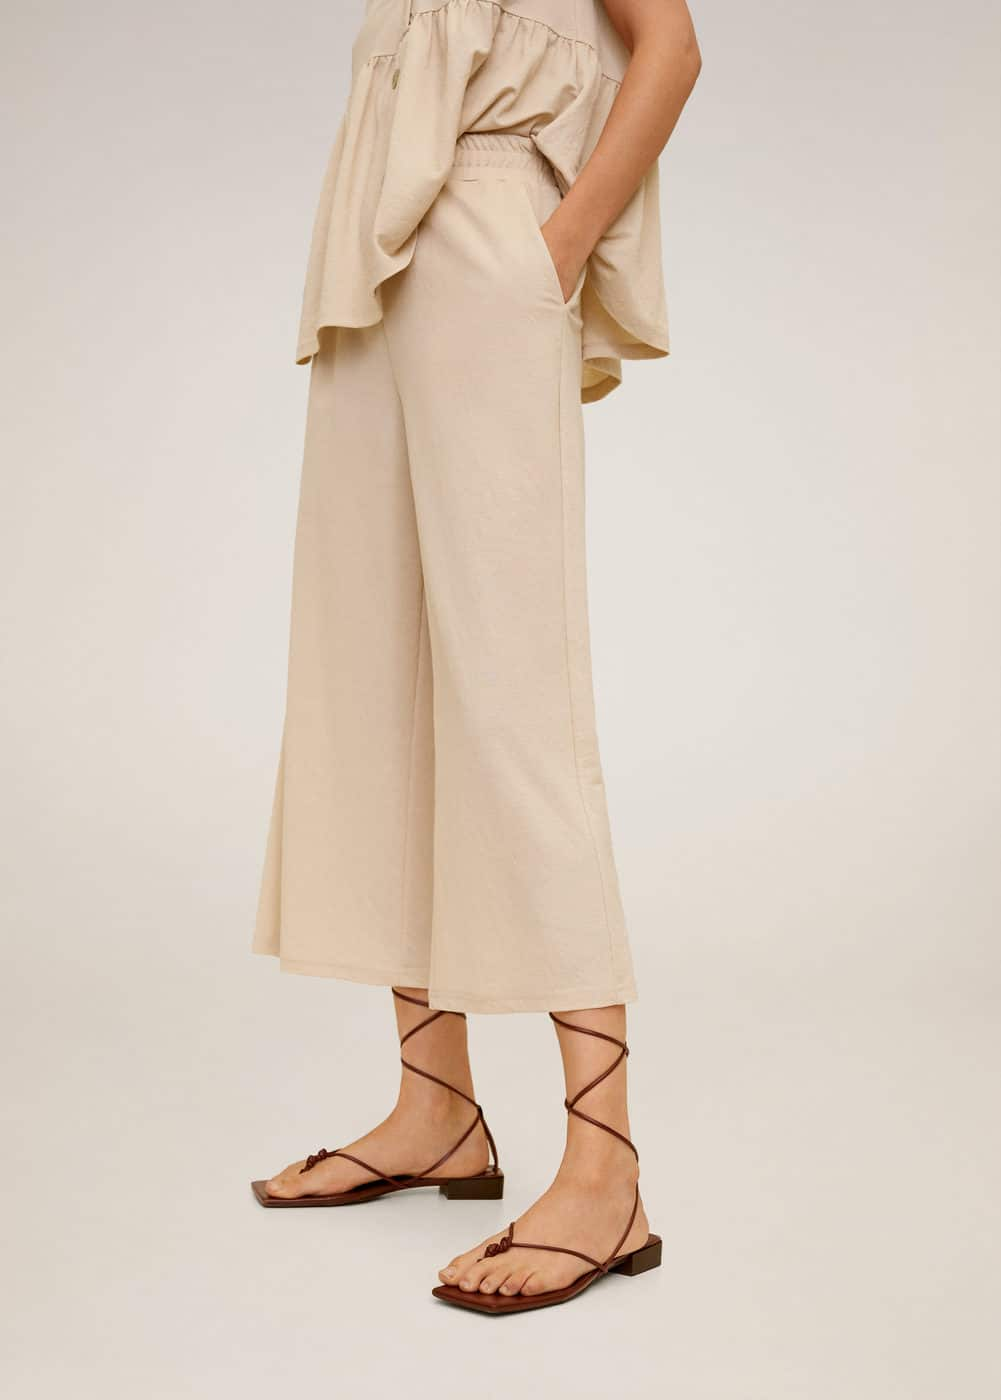 m-thalia:pantalon culotte fluido